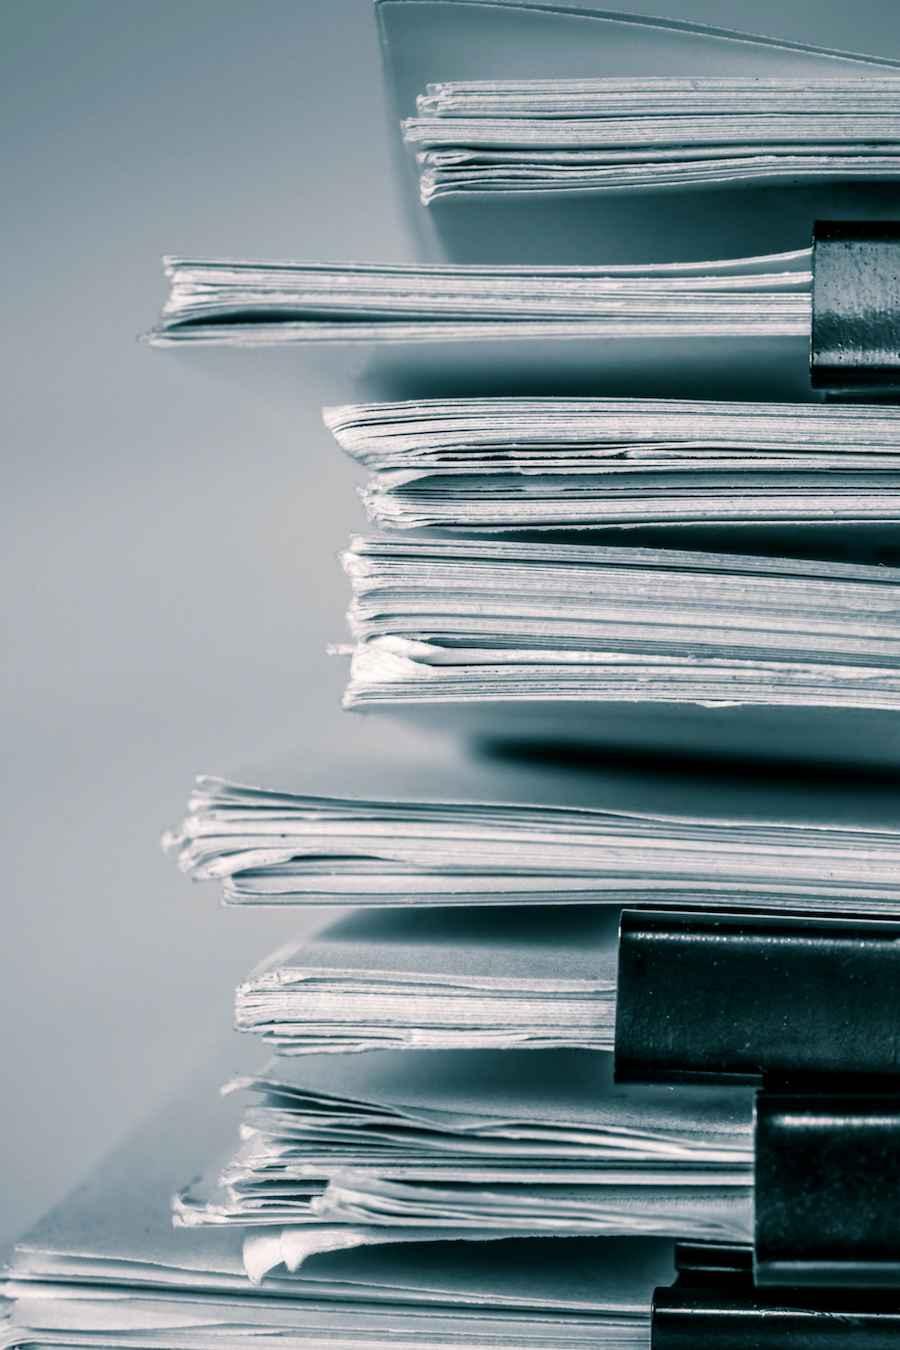 0141 - Paperwork - Whitepaper